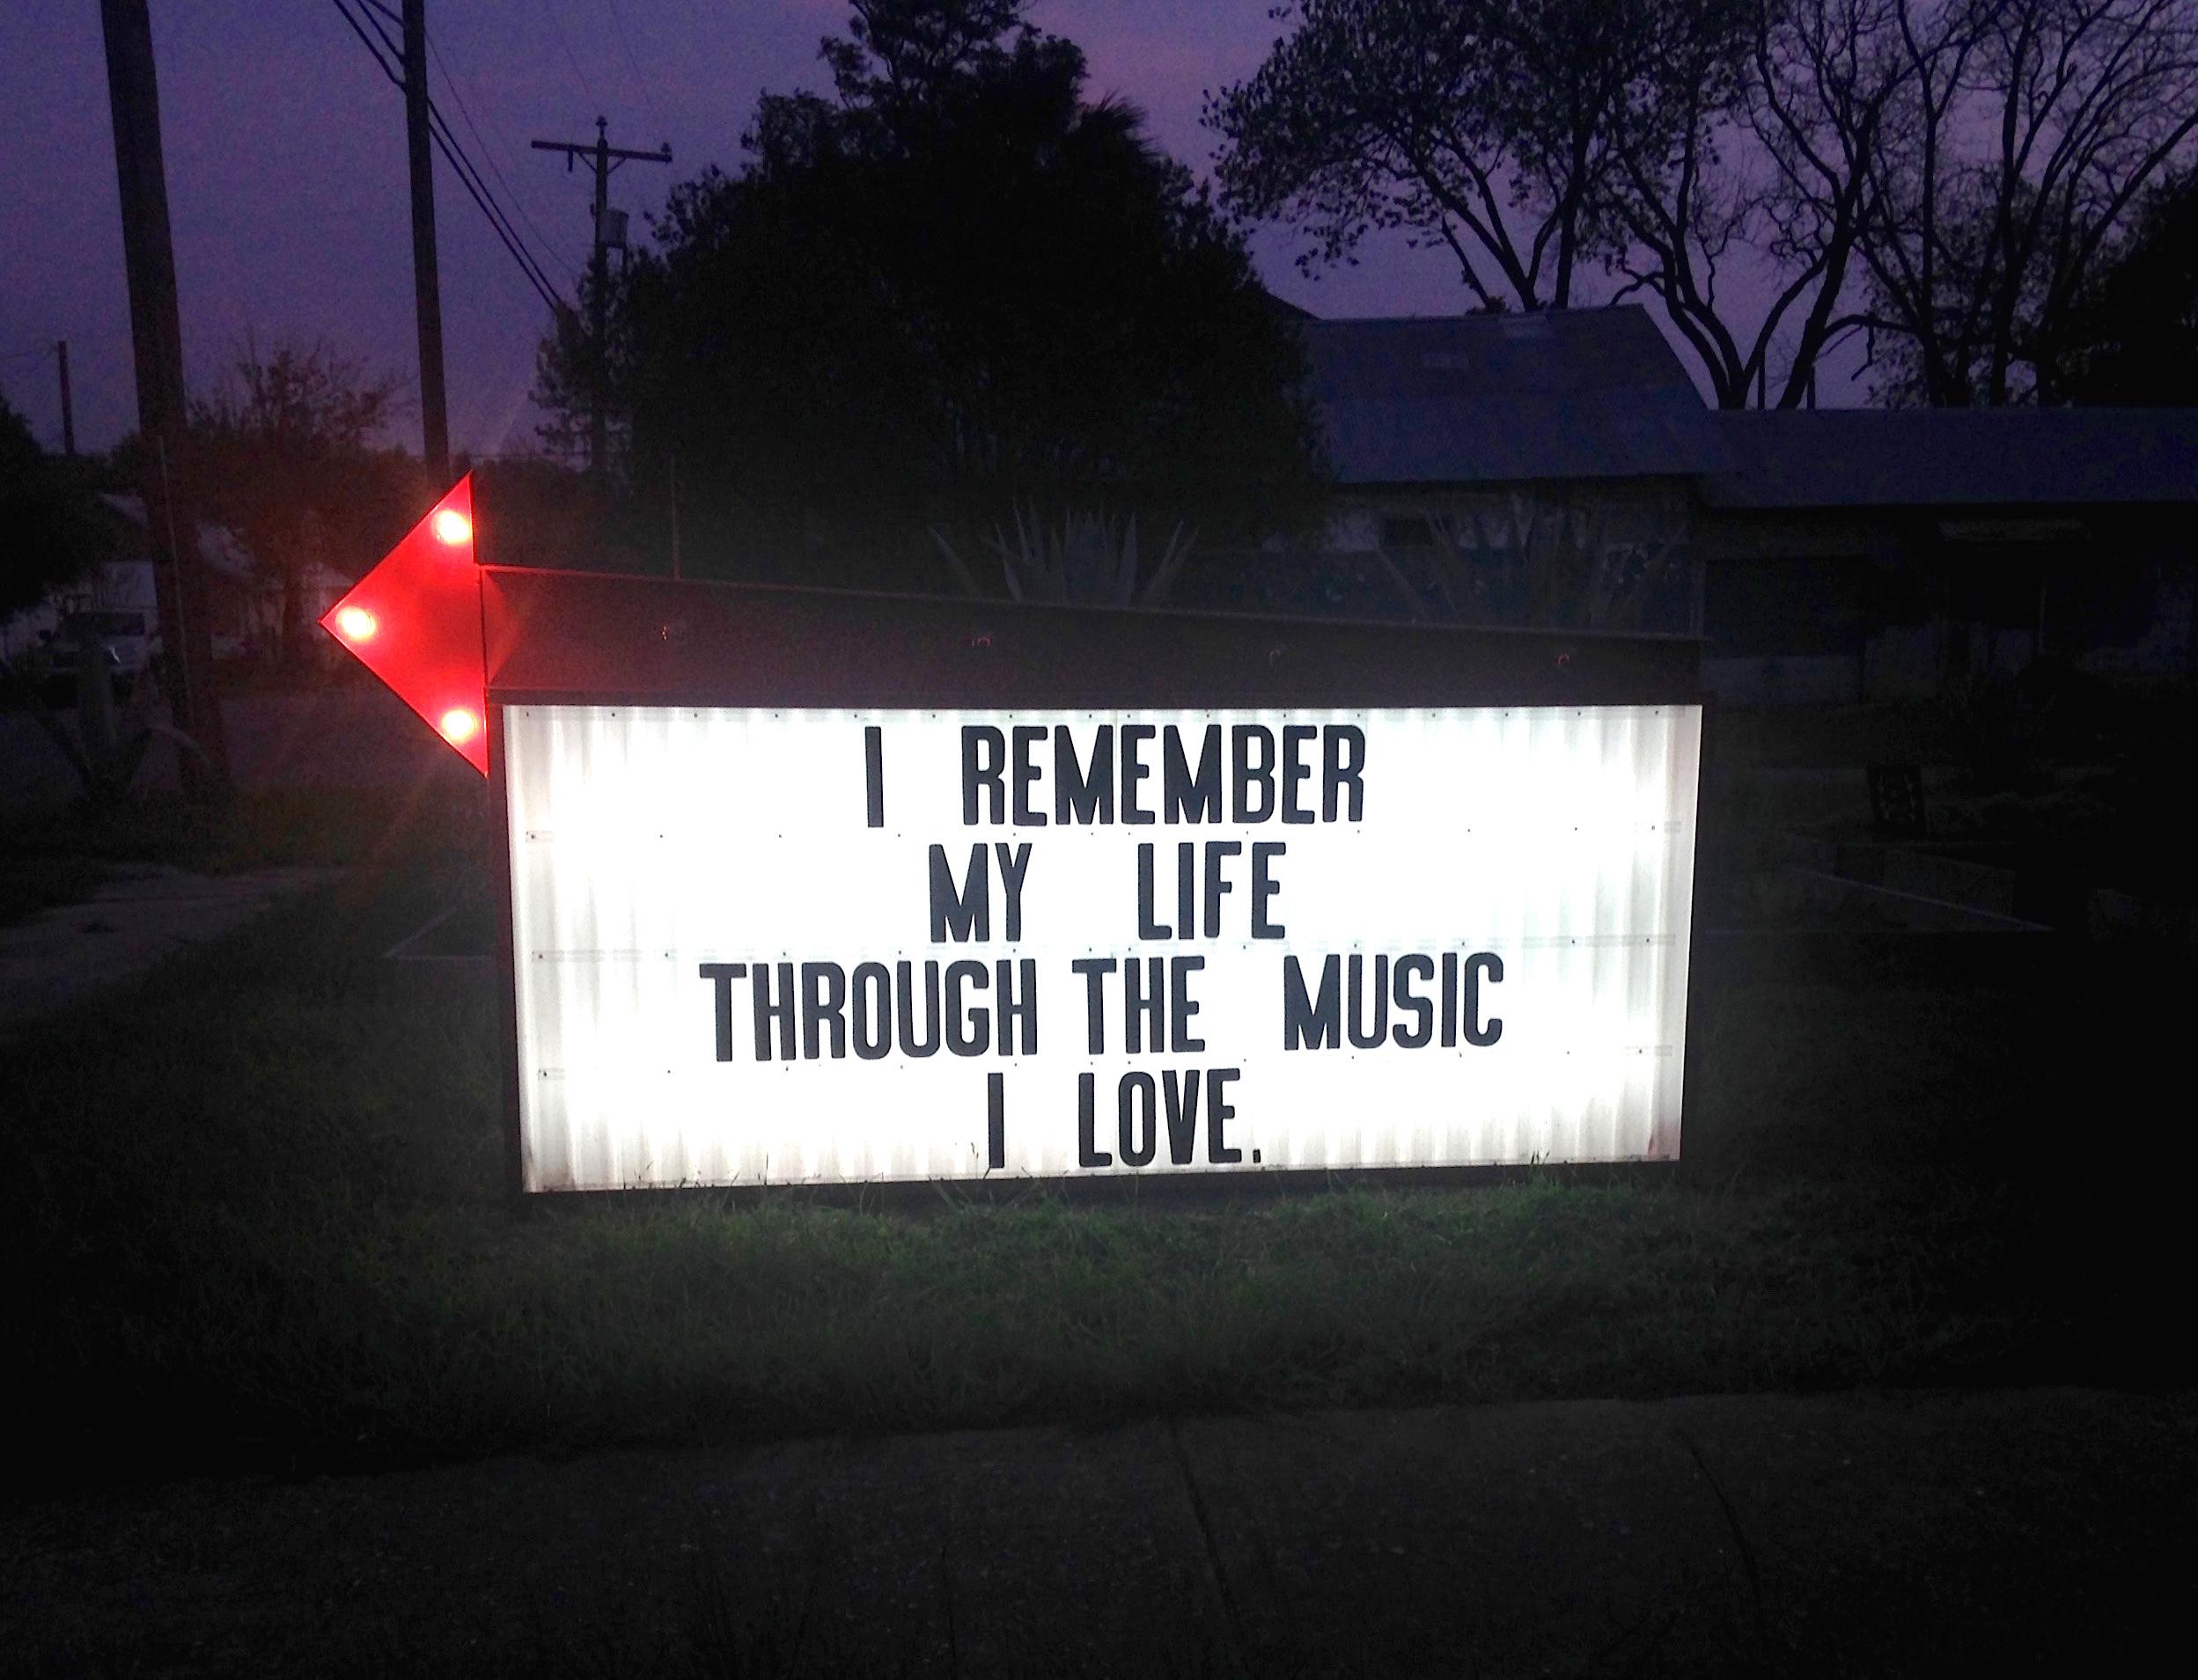 life through music3 copy.jpg